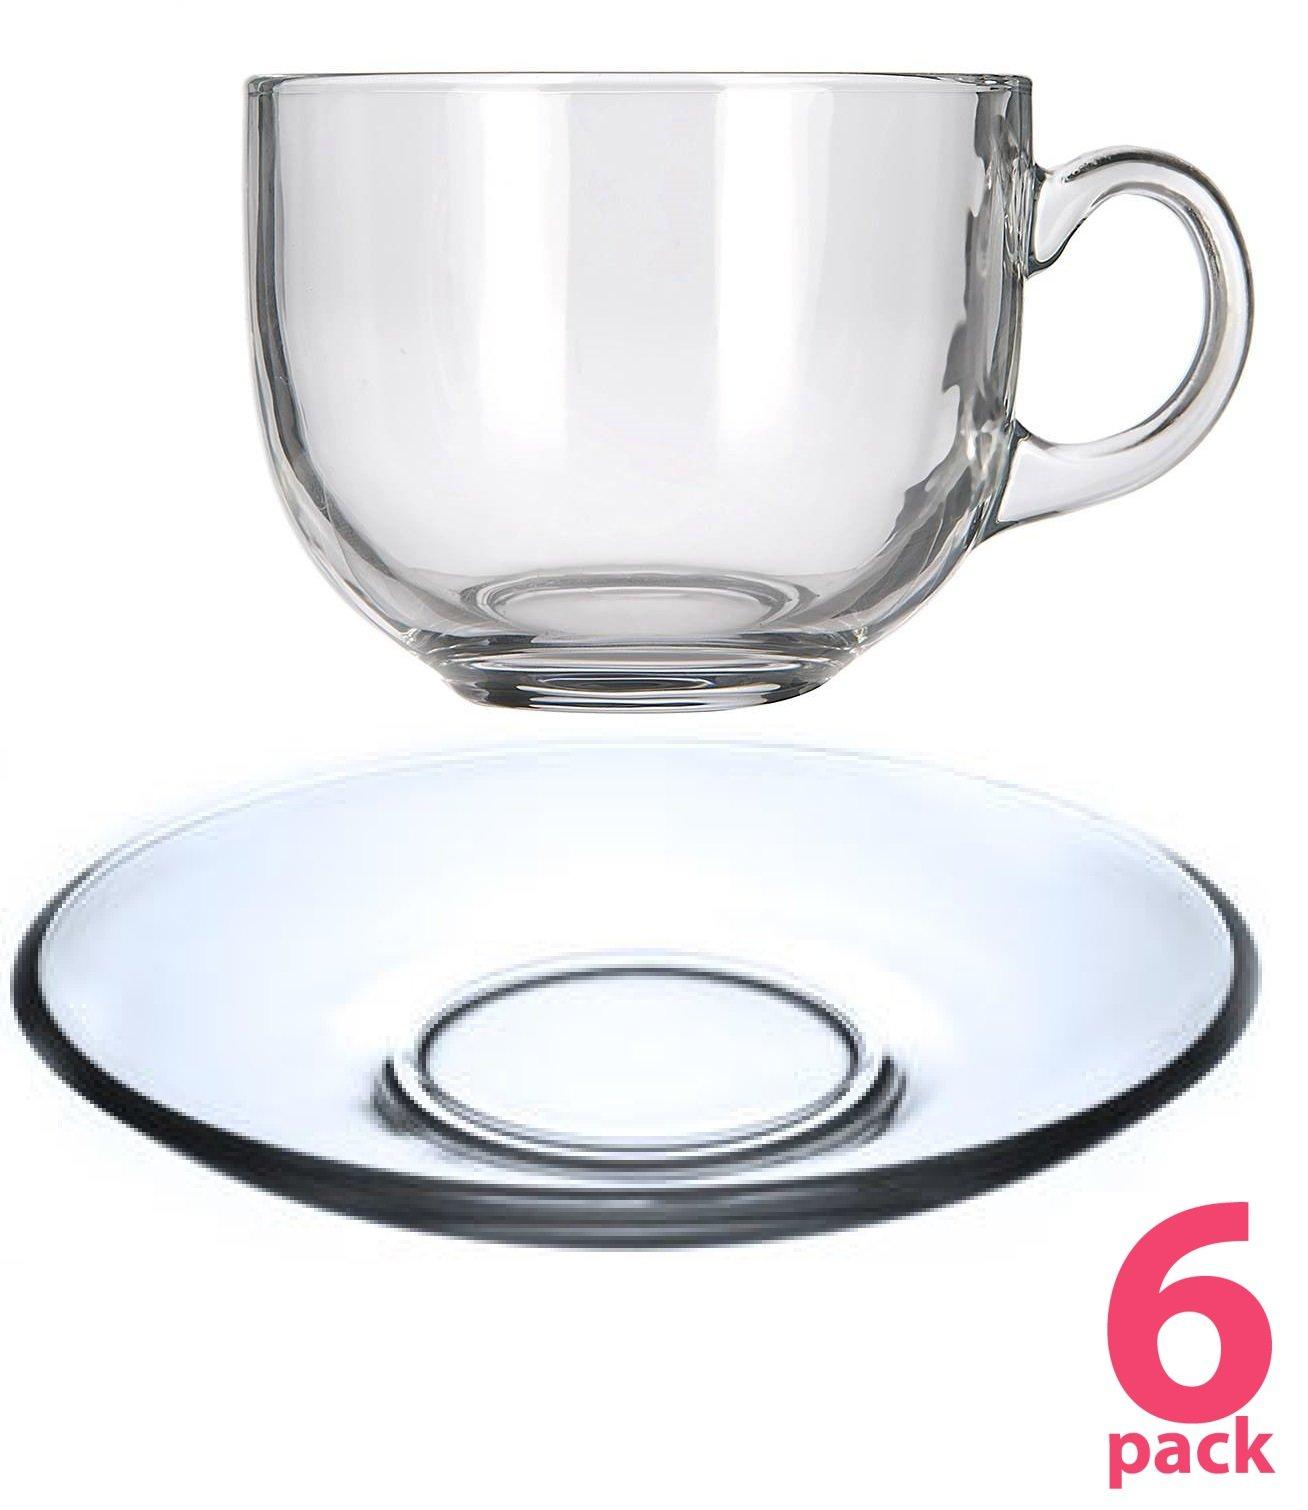 Tea/Coffee/Soup/Cappuccino Highest Quality Ultra Clear See Through Glass Jumbo Mugs and Saucers Set, 12 Piece (16 OUNCES JUMBO)